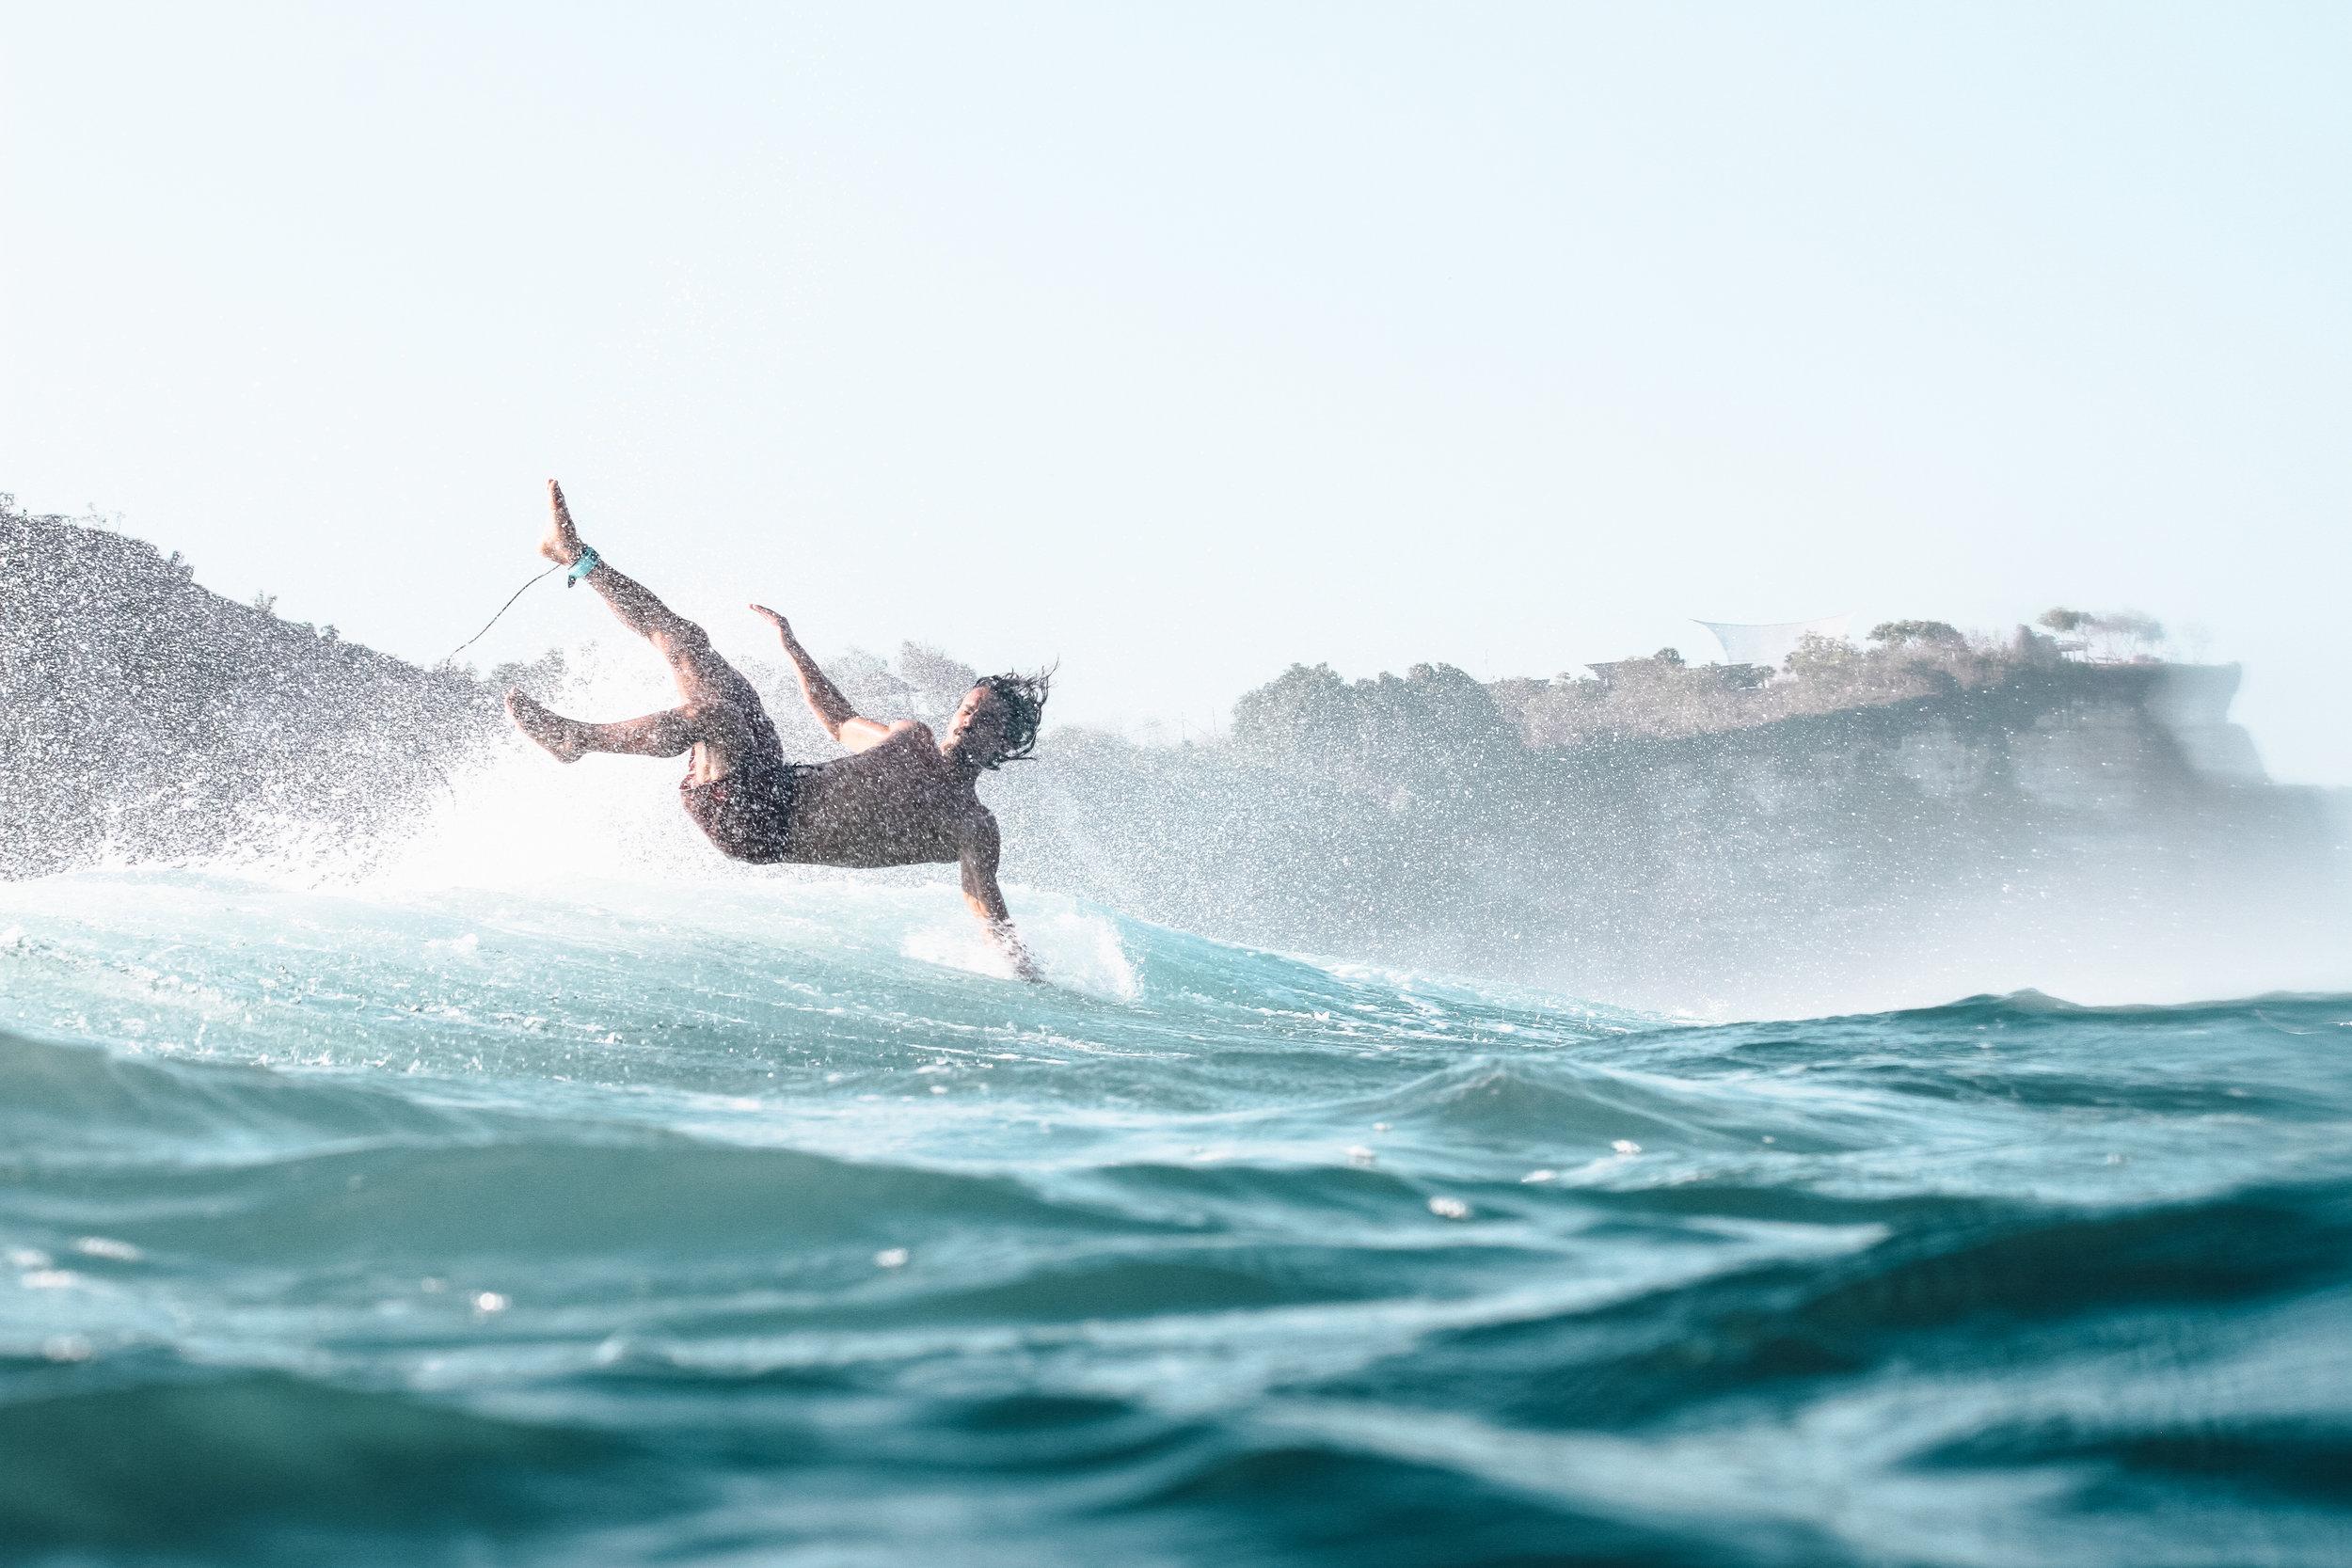 CharlottePieper-timo specht mighty otter surfboards muenchen.JPG